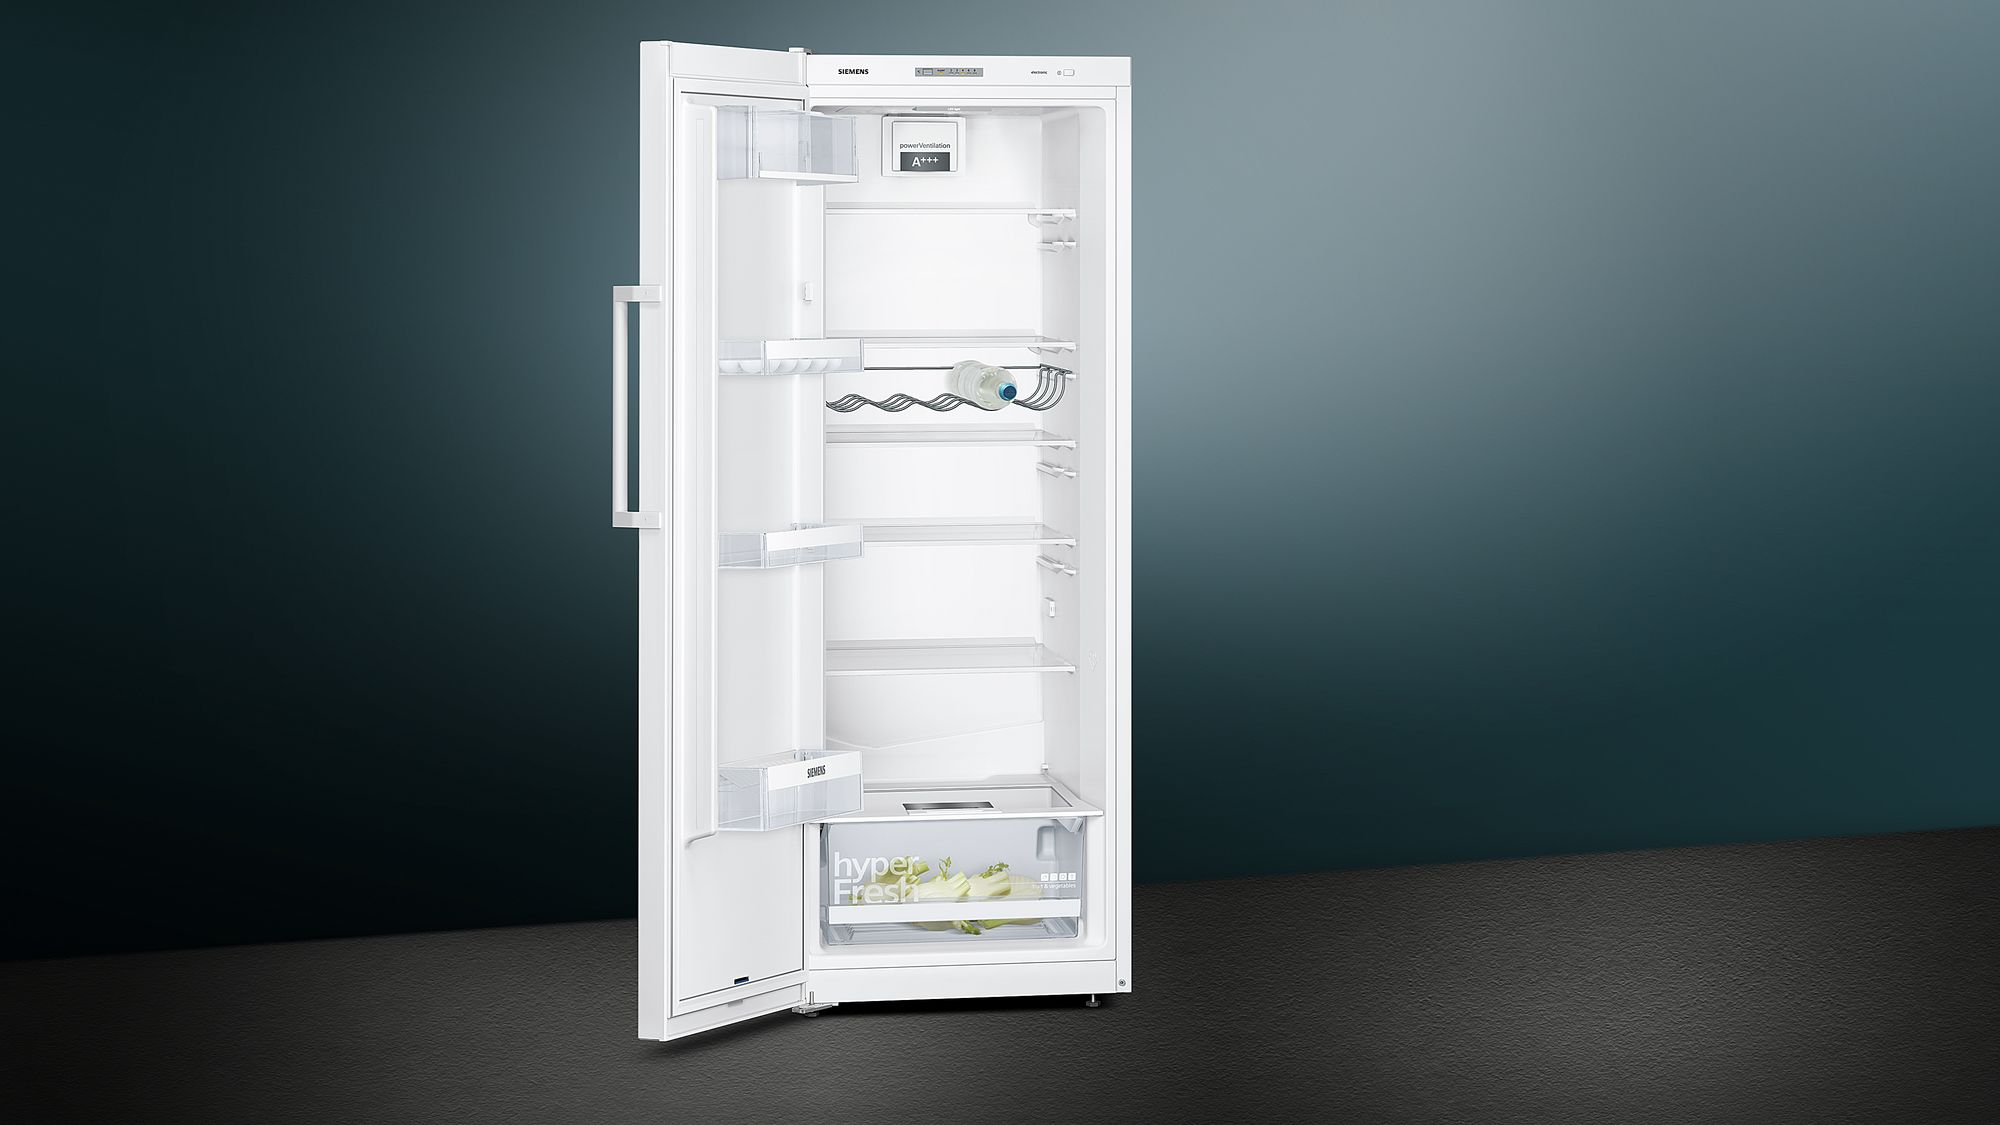 Siemens Kühlschrank Weiß : Siemens stand kühlschrank weiß iq ks vvw p psi